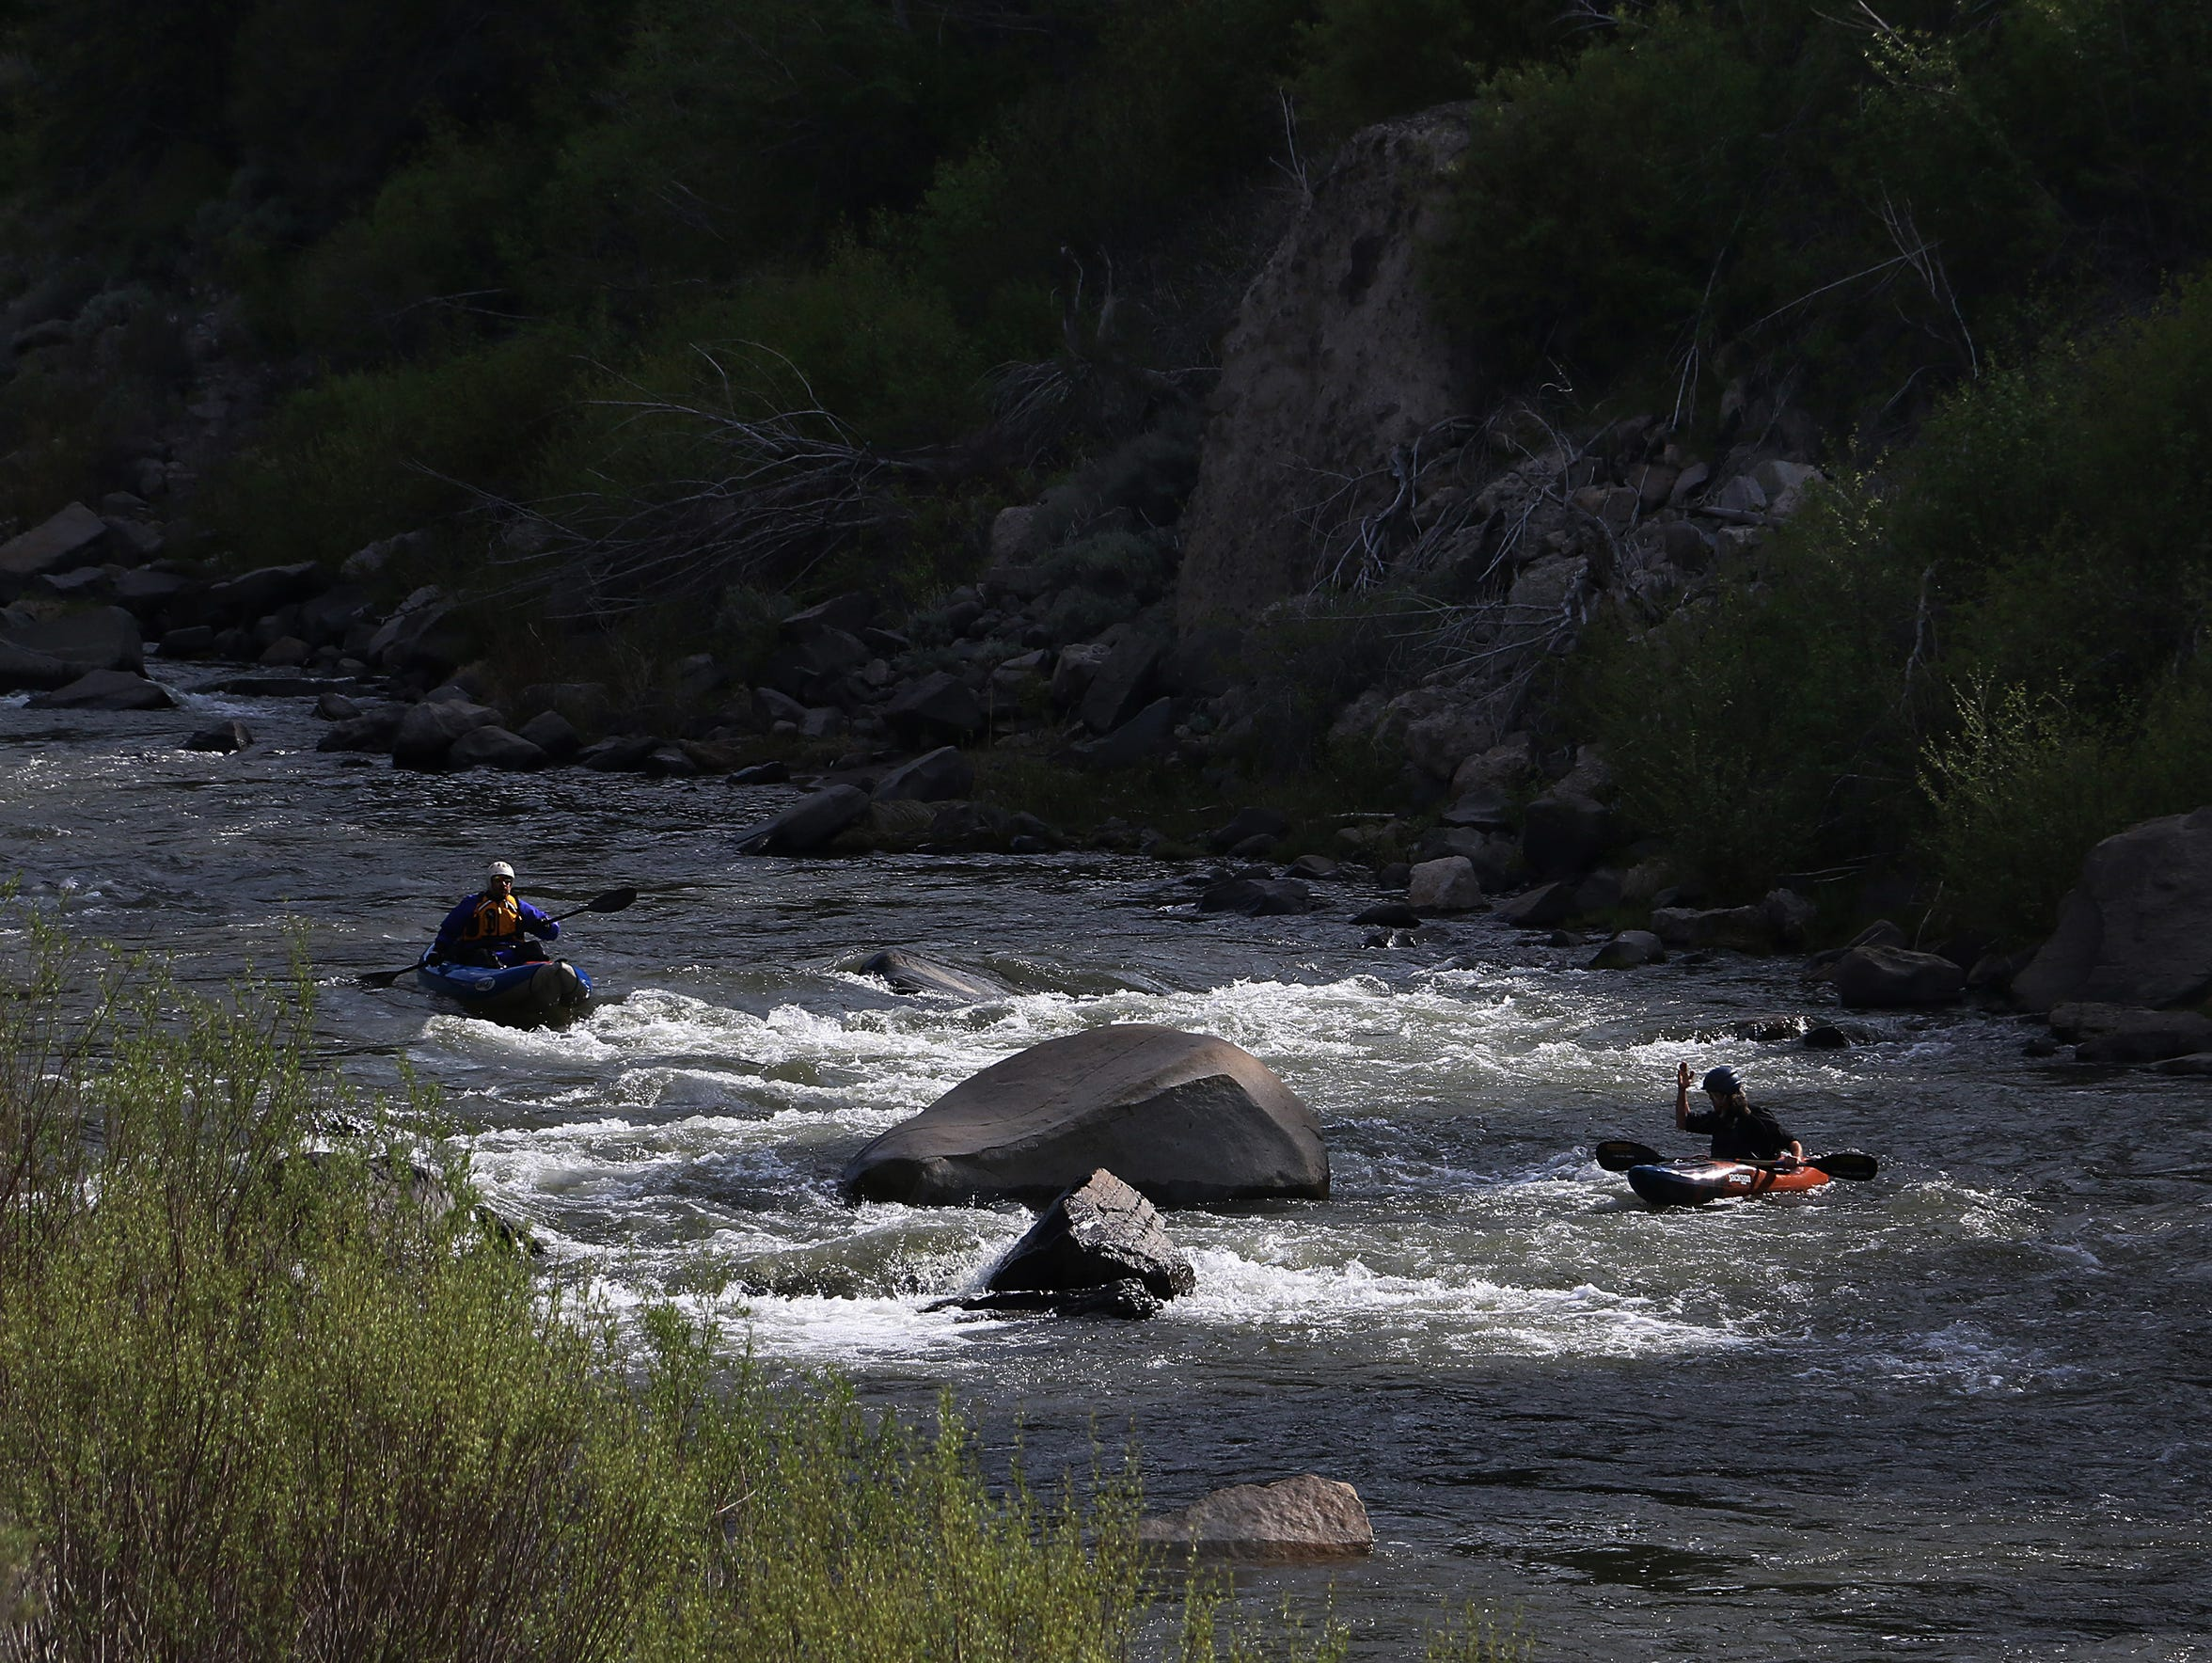 Preparing to run rapids on the Truckee River between